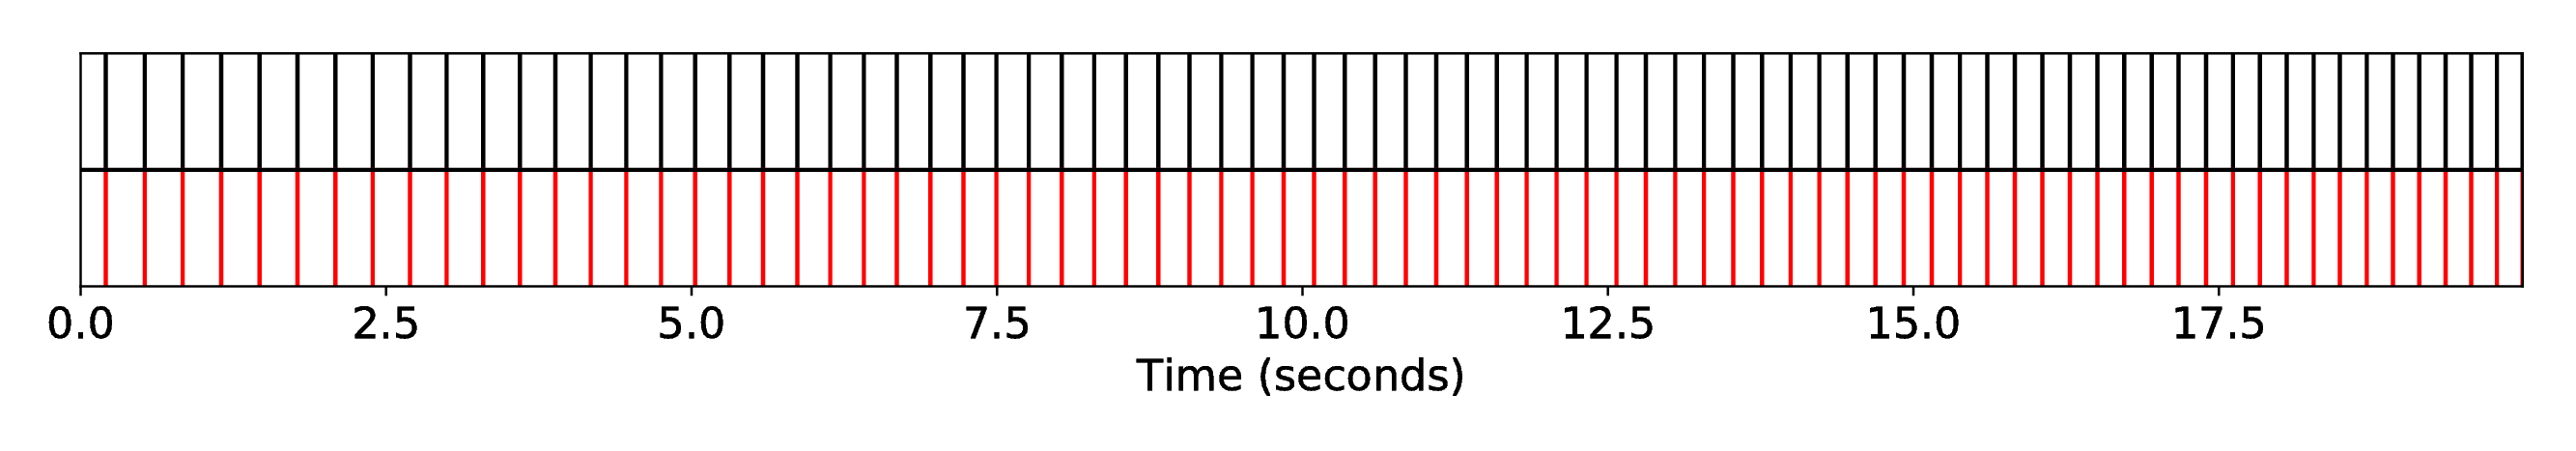 DP1_INT1_R-RW-Train__S-Fandango__SequenceAlignment